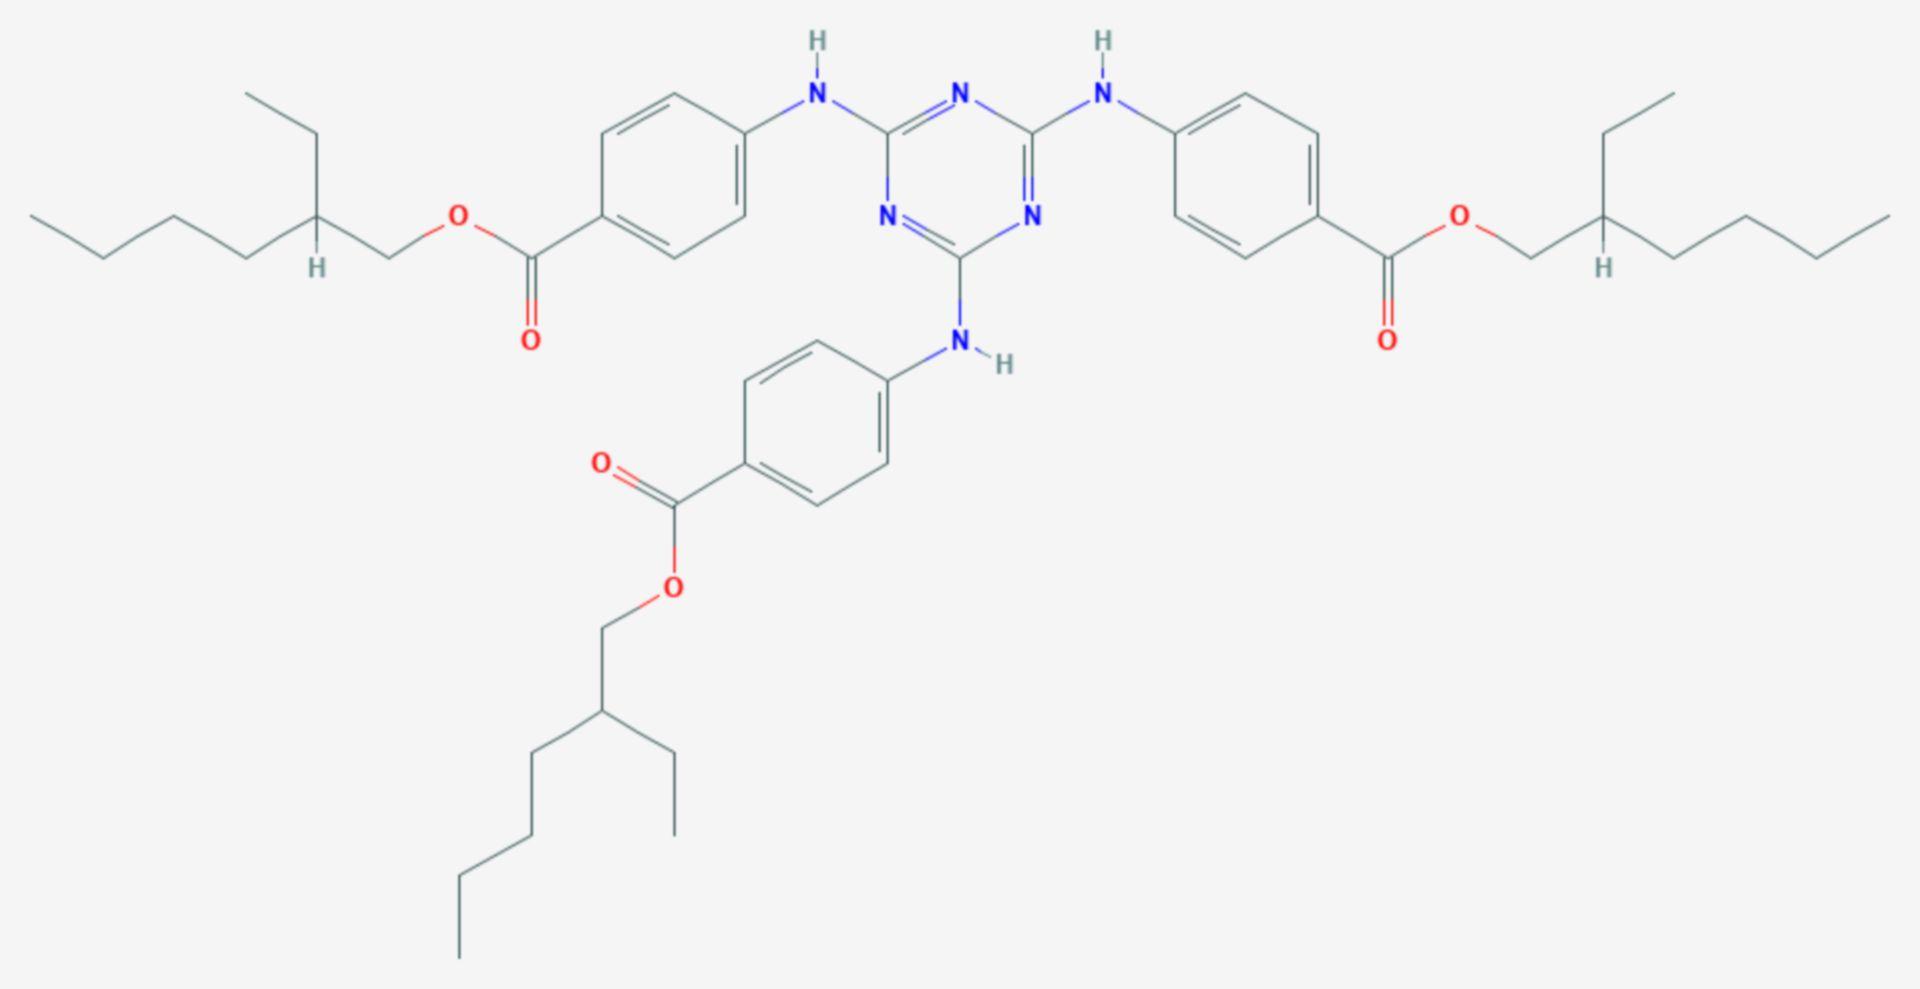 Octyltriazon (Strukturformel)